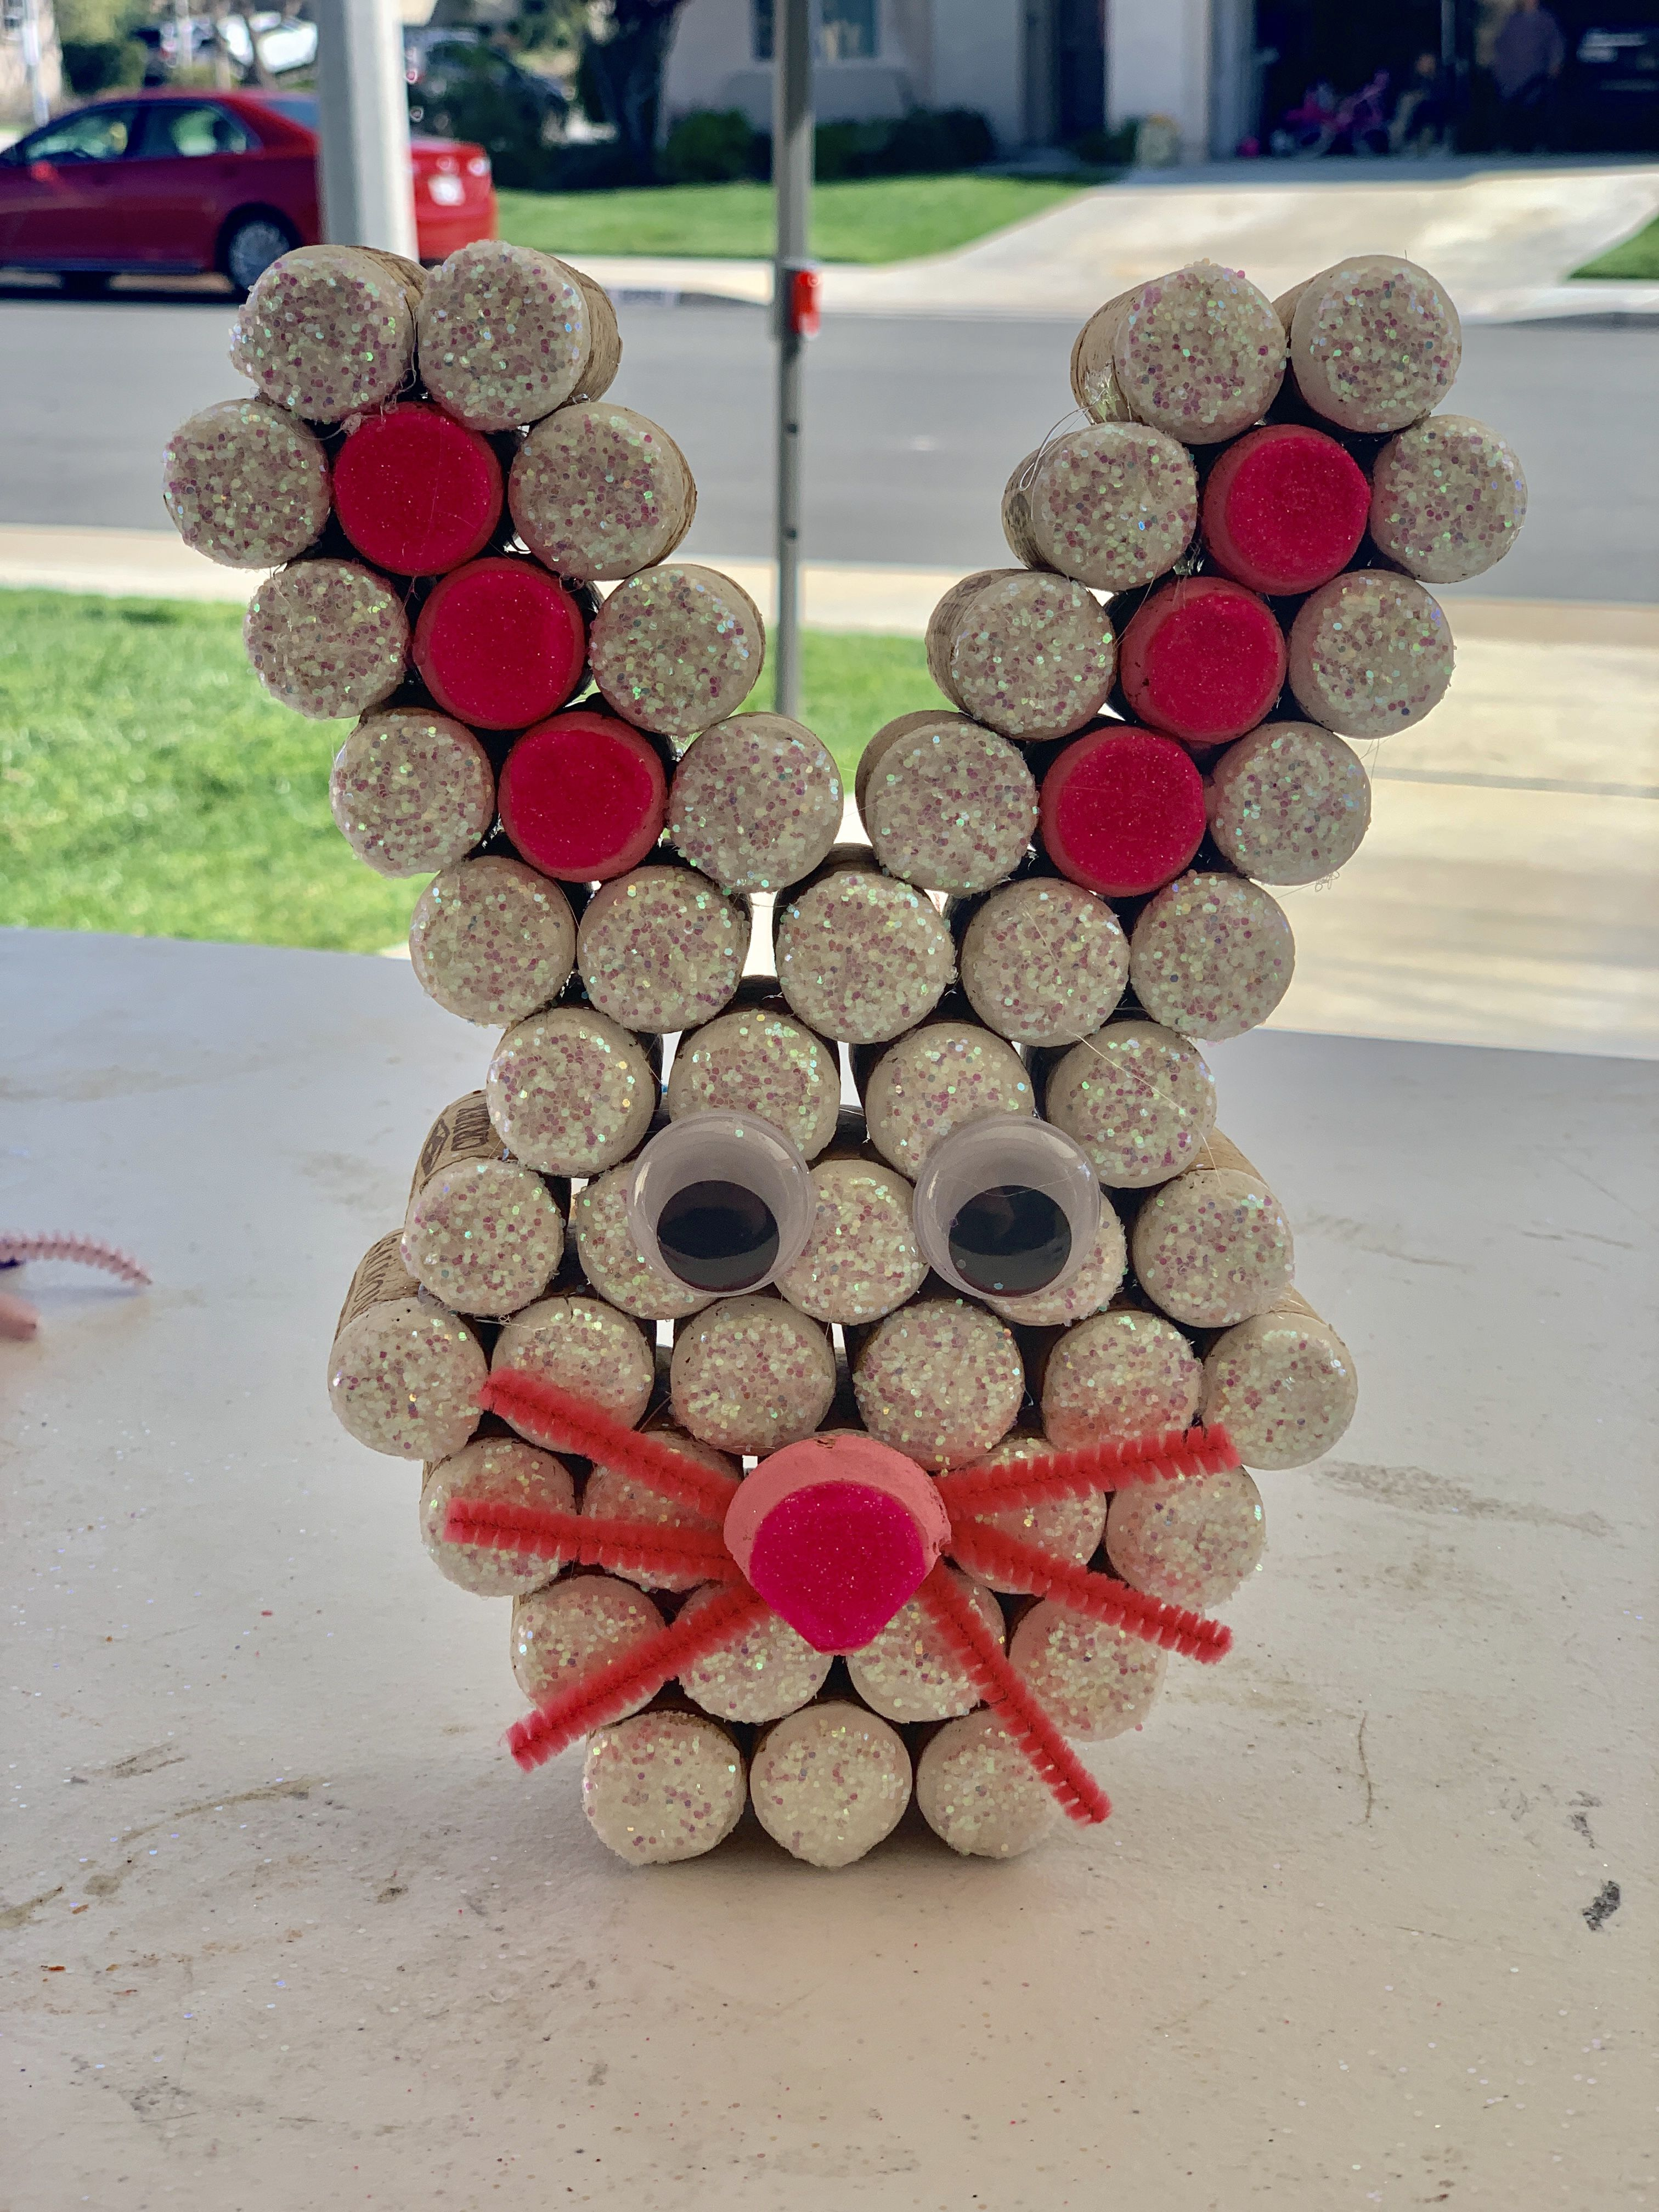 Easter Bunny Made Of Wine Corks Wine Cork Crafts Wine Cork Art Wine Cork Projects